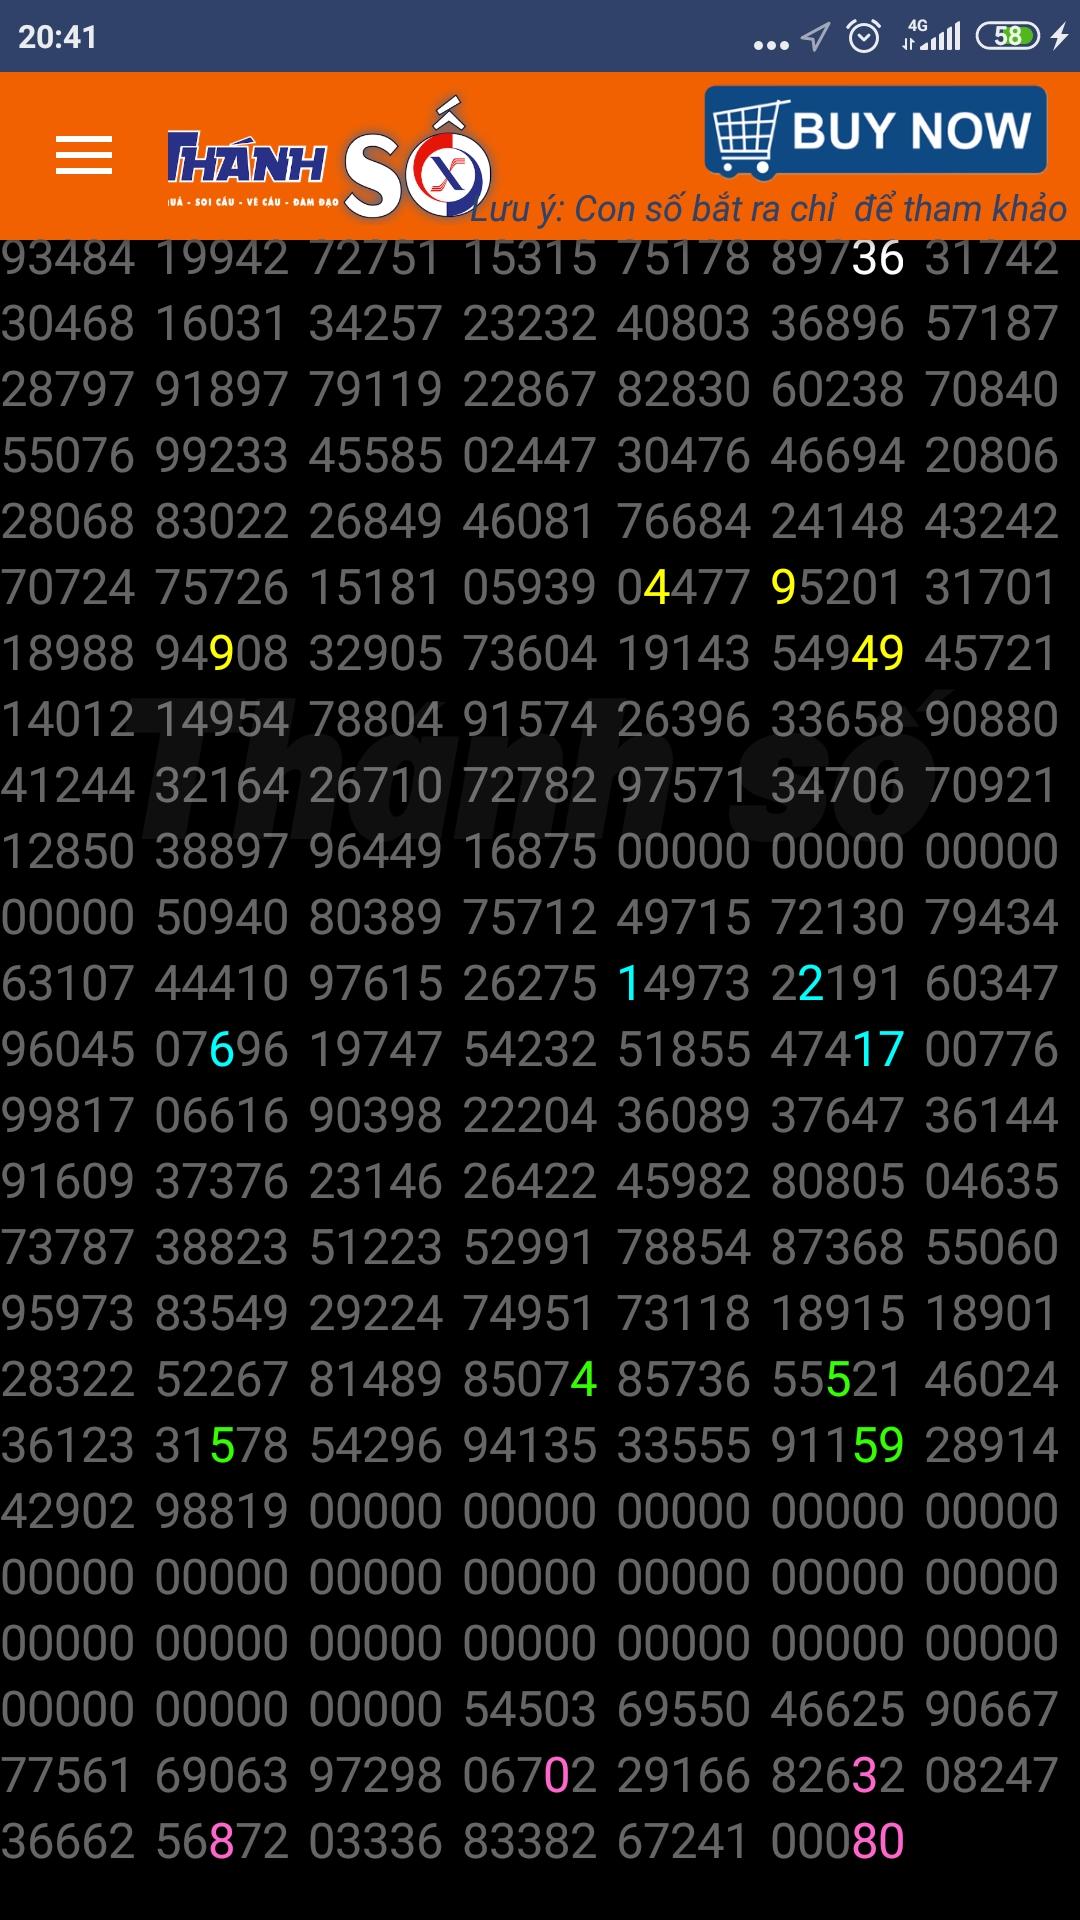 Screenshot_2020-05-08-20-41-42-584_com.thanhso.tool.jpg